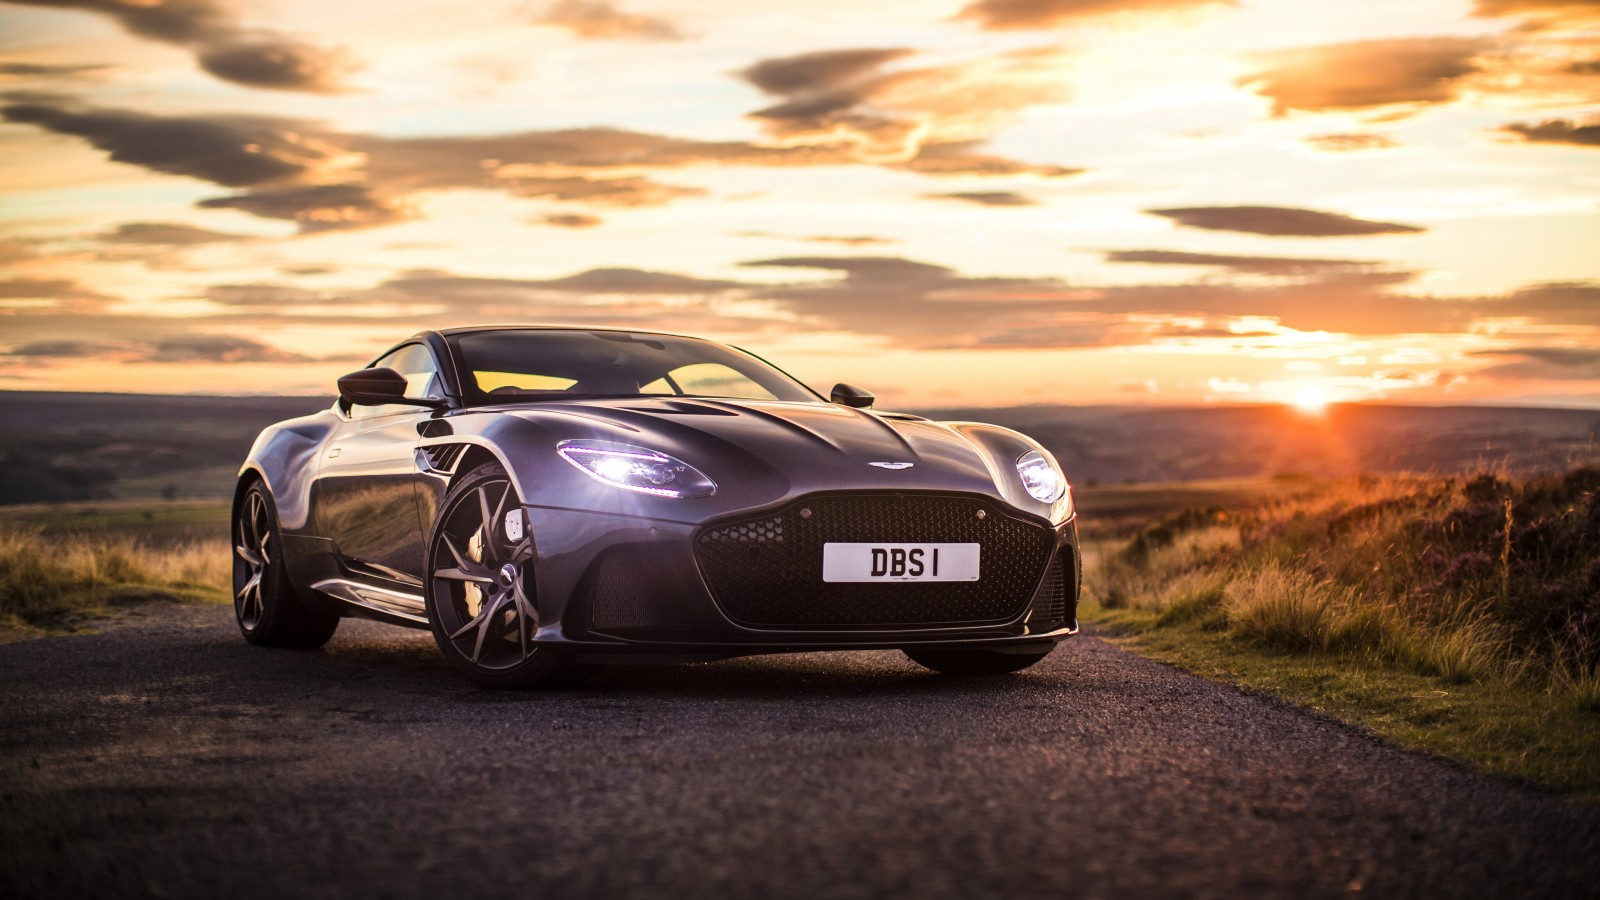 Lotus Wallpaper Iphone X Aston Martin Dbs Superleggera 2019 4k Wallpaper Hd Car